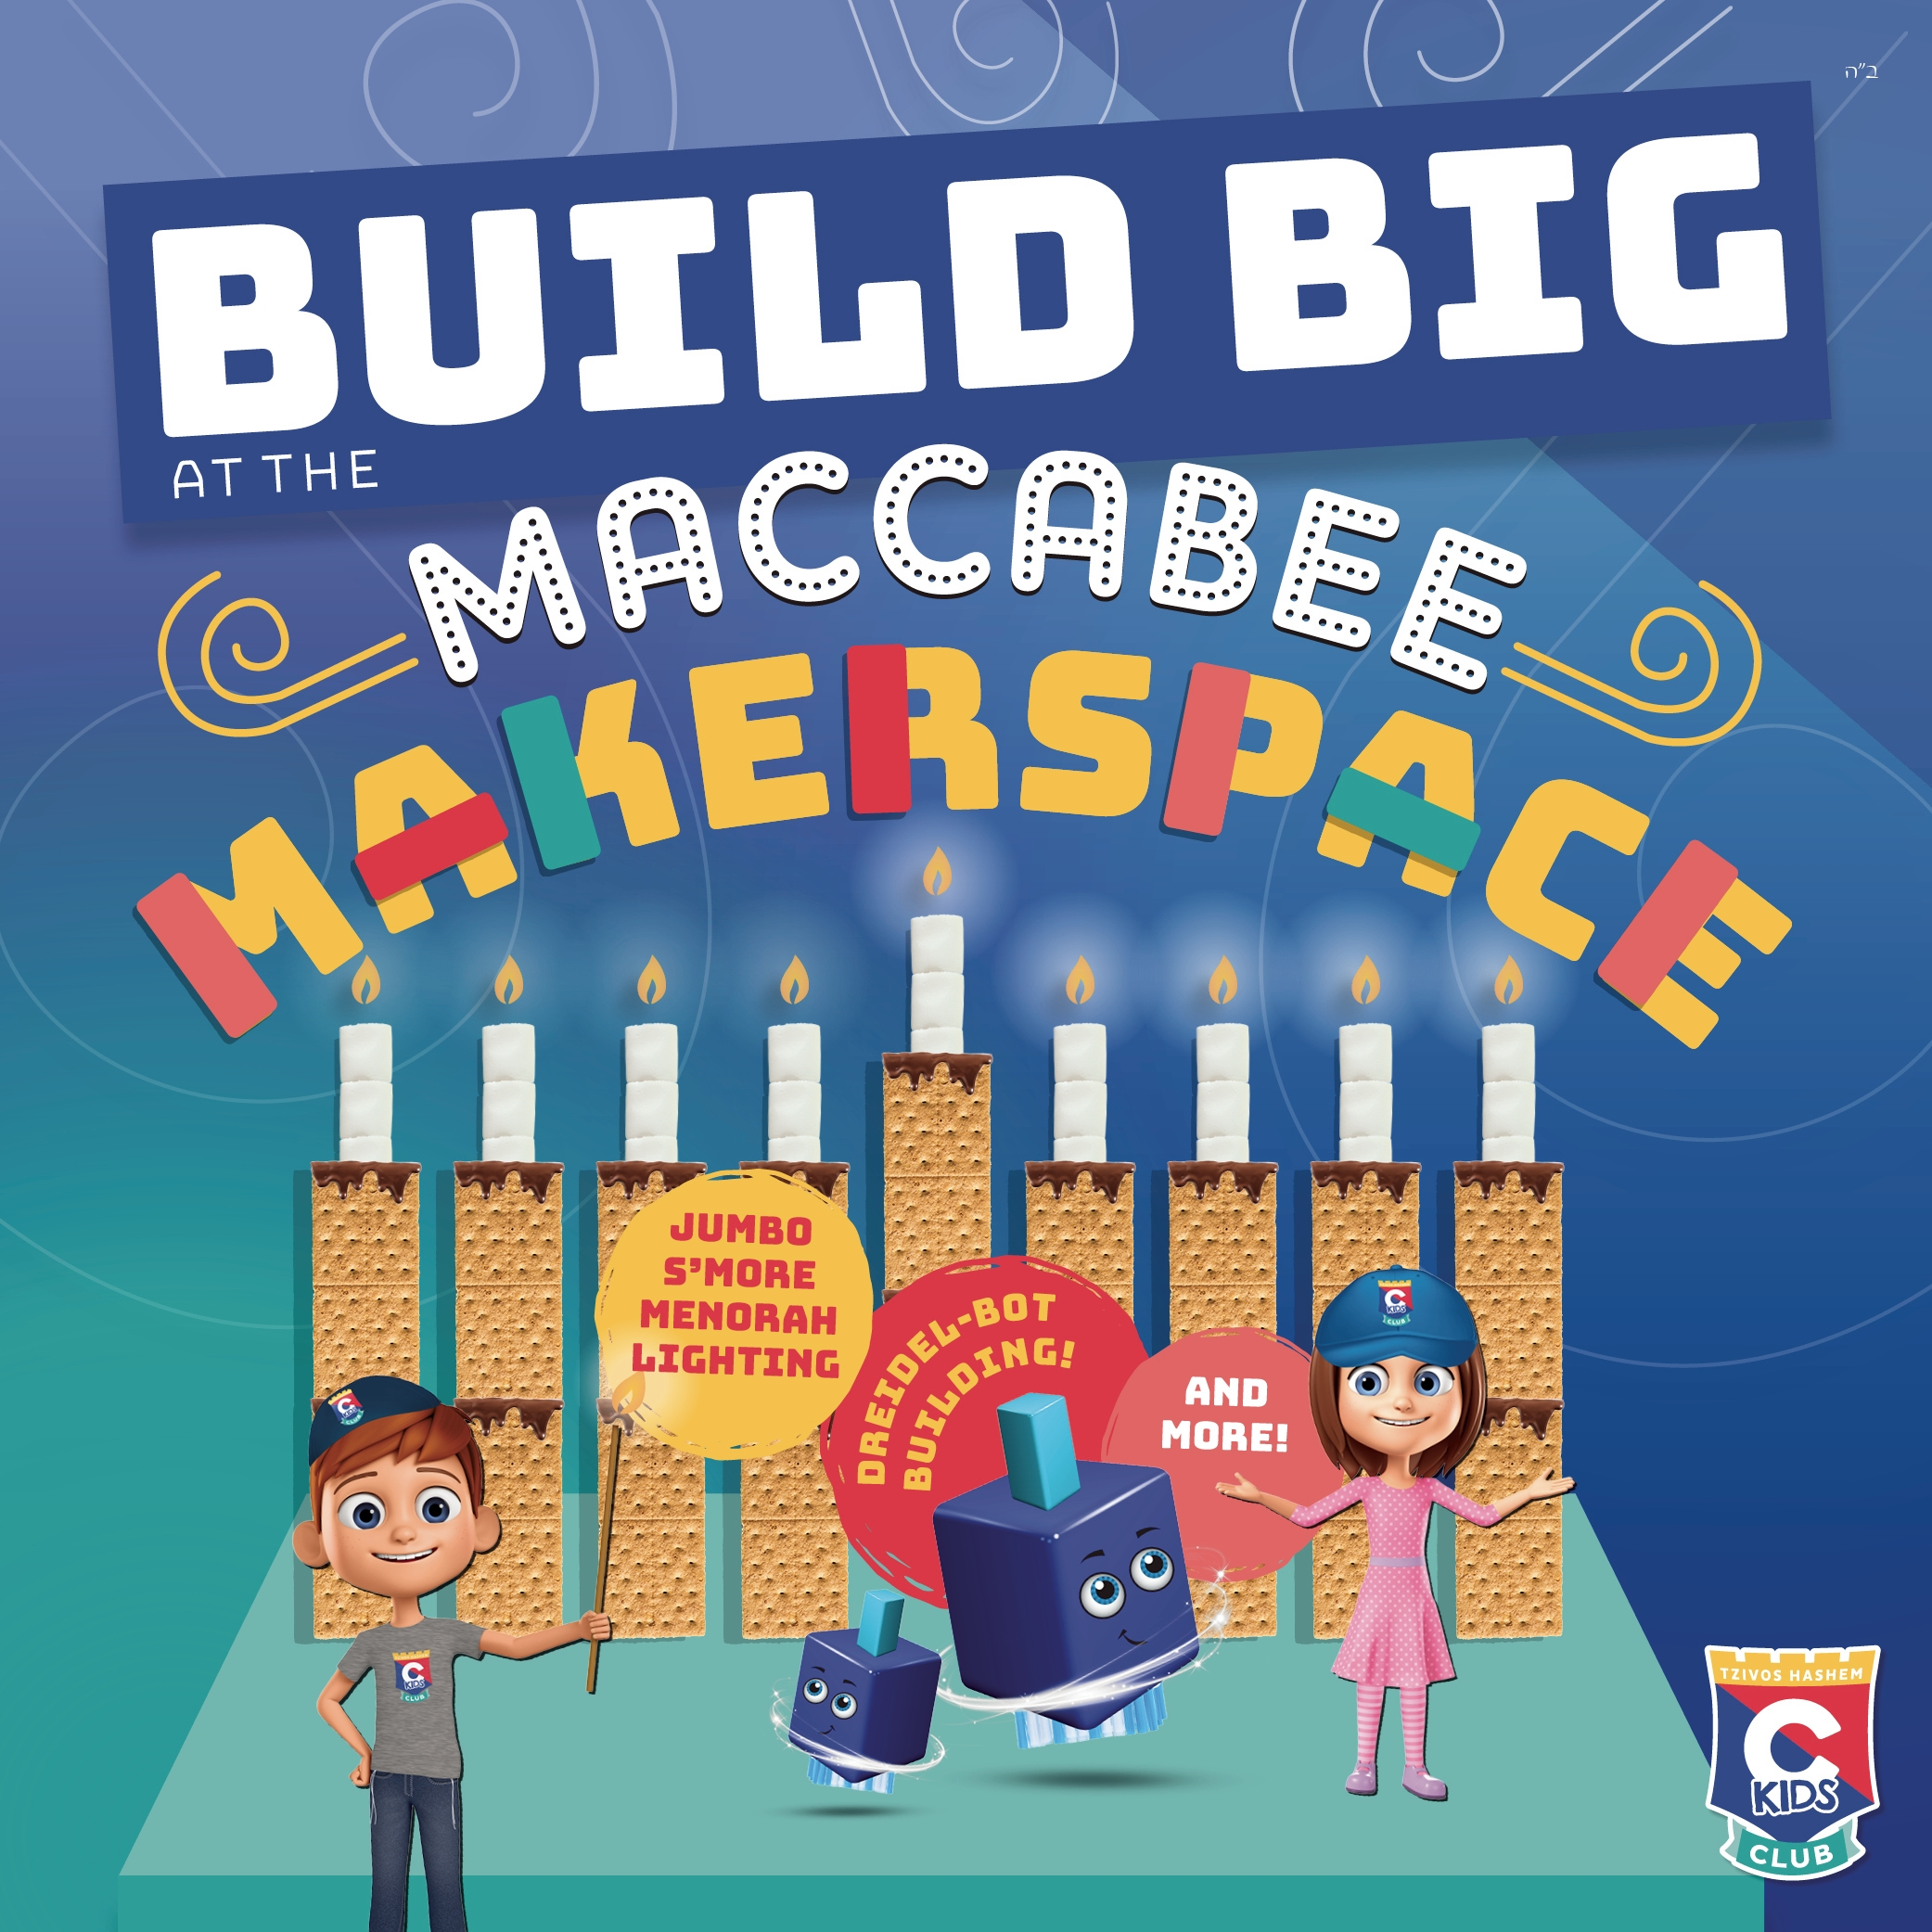 Facebook Post 4 (Ckids Club Maccabee Makerspace) (1).jpg